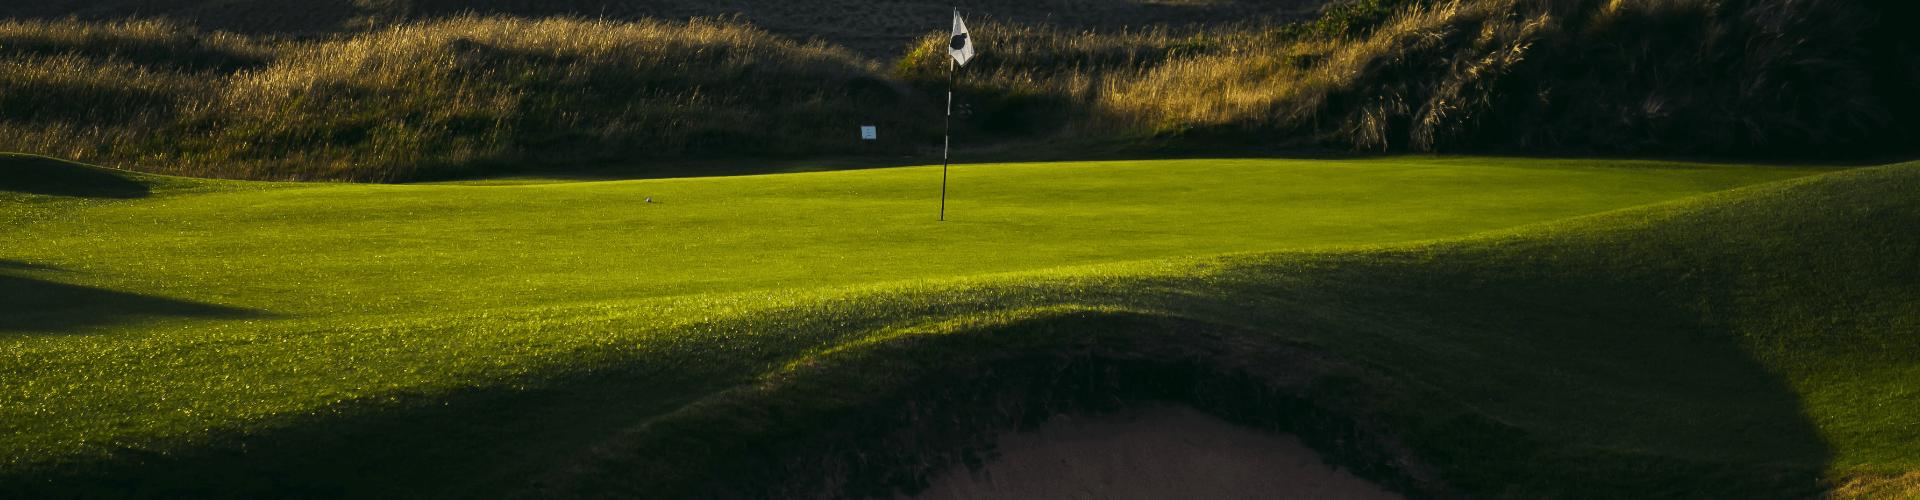 Venez decouvrir notre golf